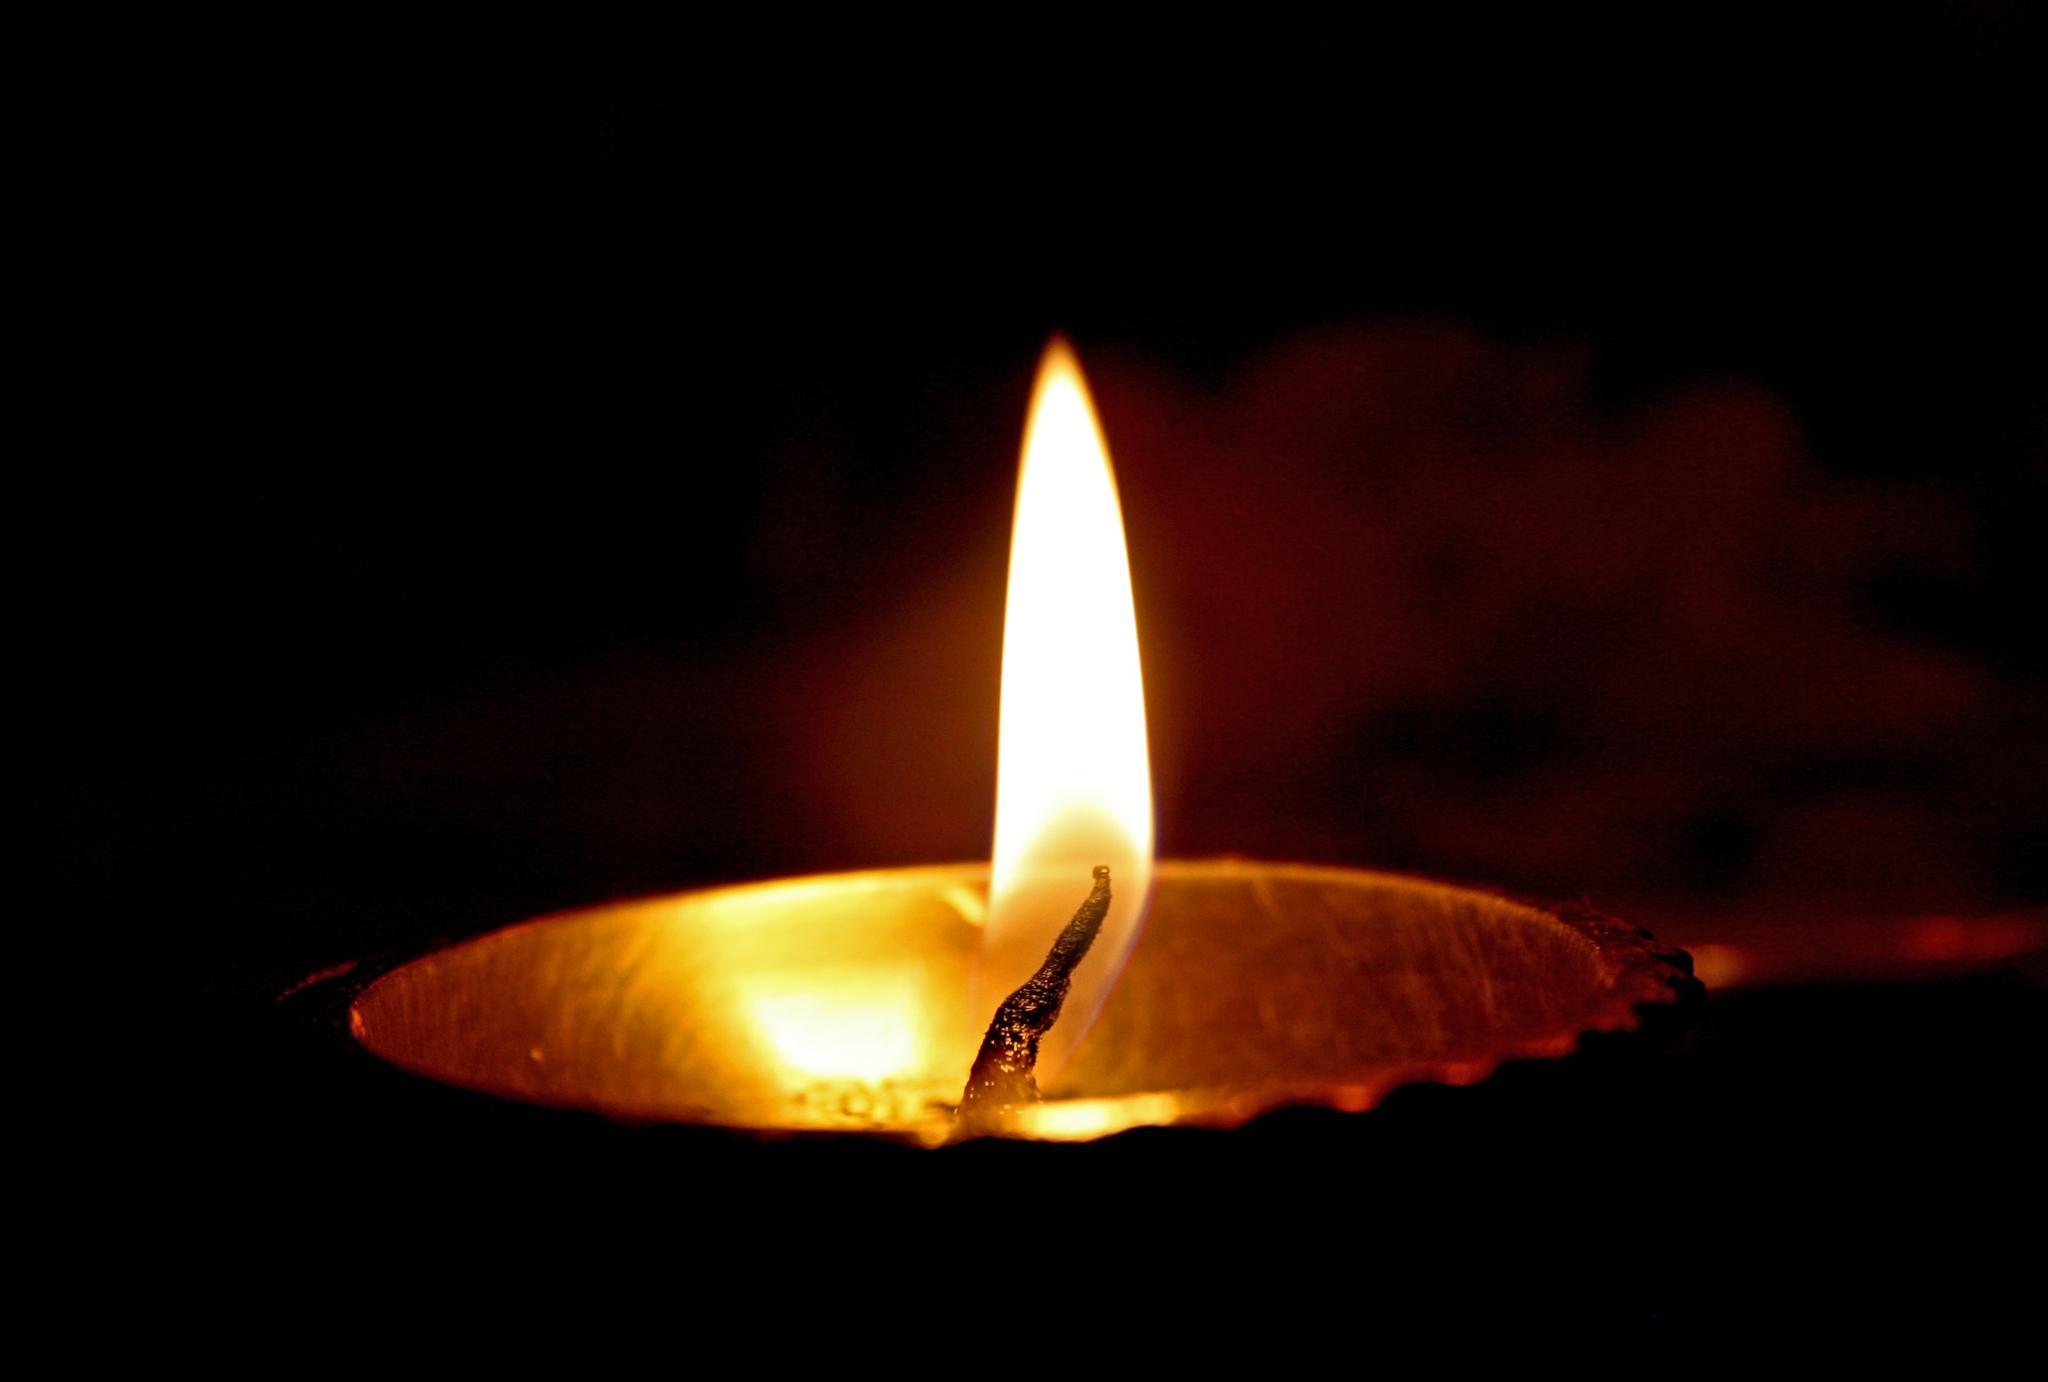 when its dark, light the lamp by Aviral Mehta